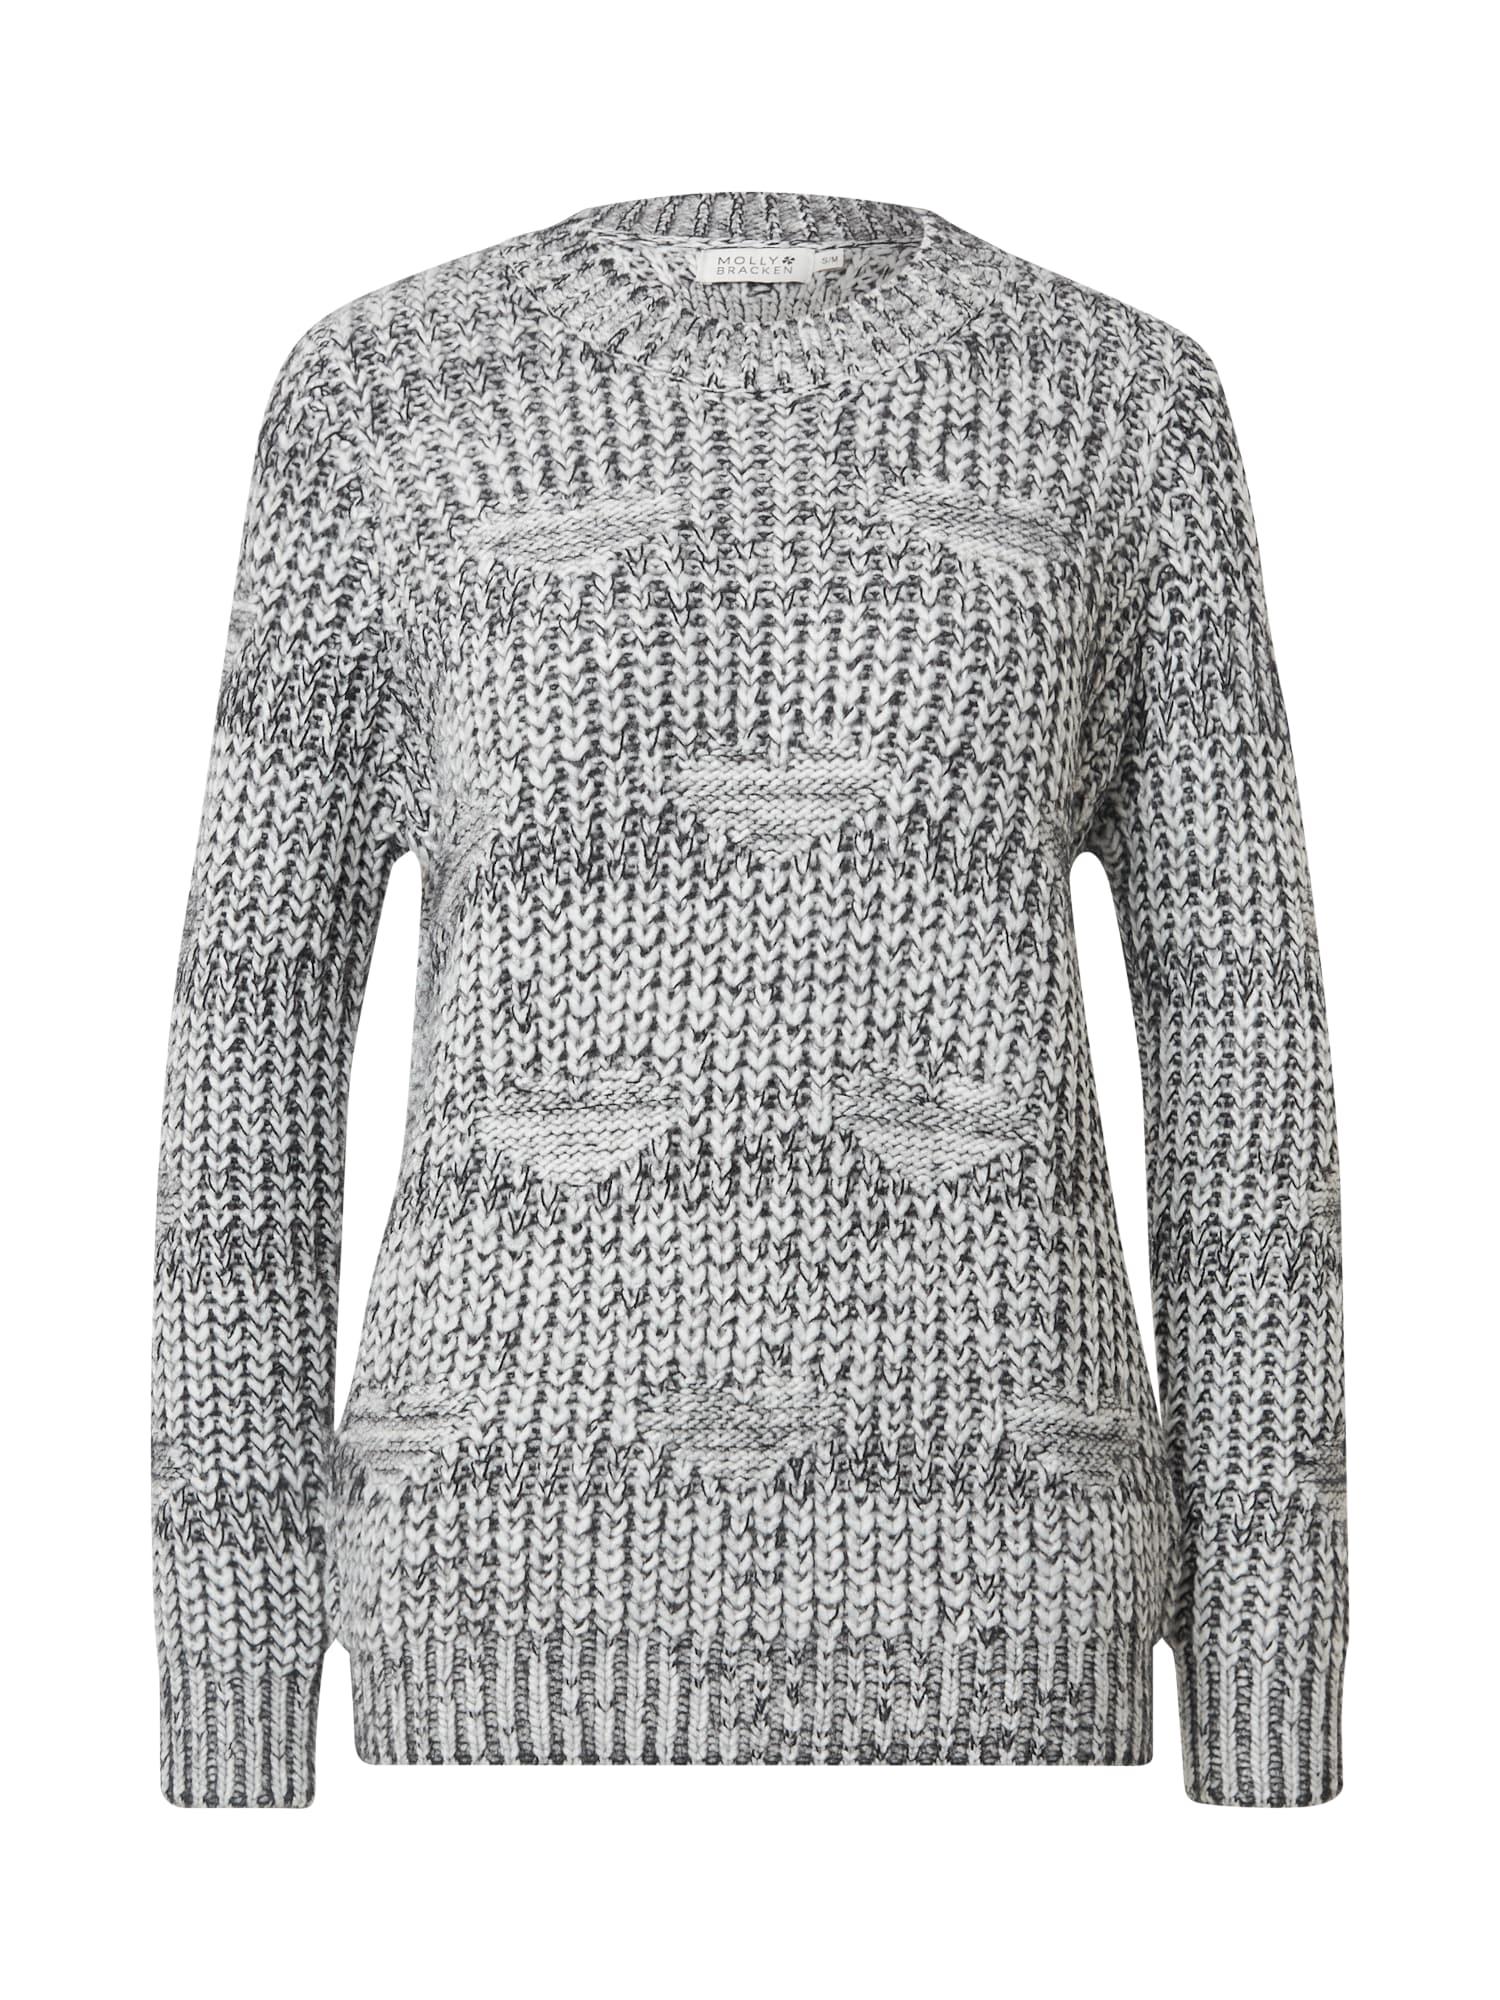 Molly BRACKEN Megztinis margai pilka